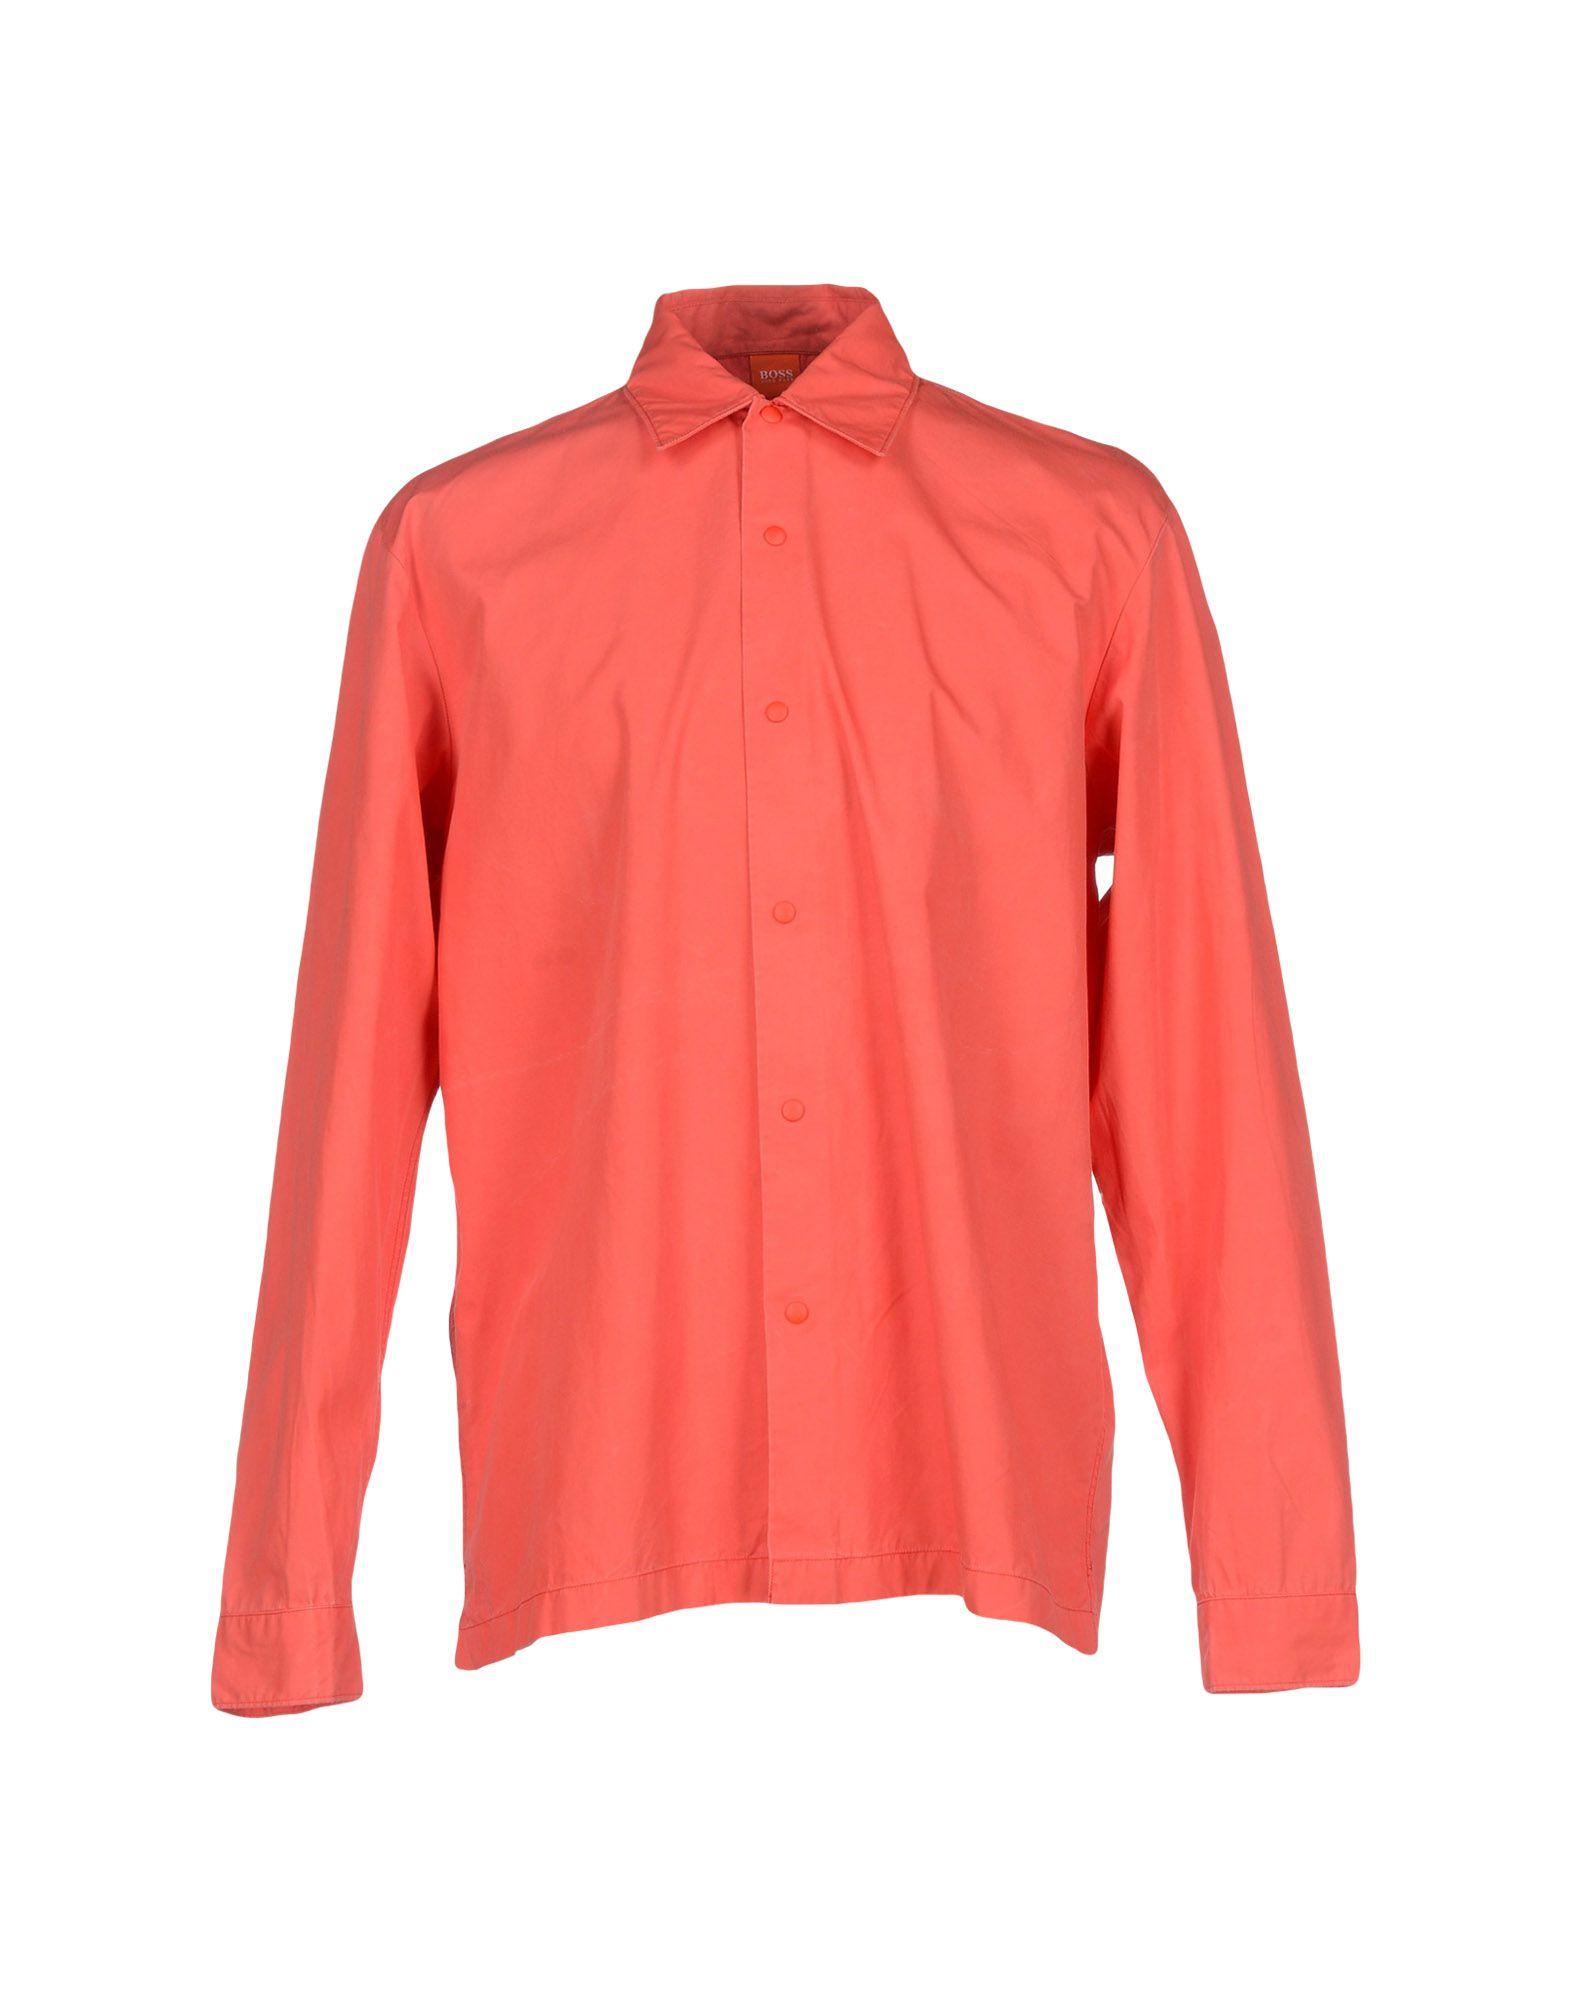 boss orange shirt men boss orange shirts 38520595tt on popscreen. Black Bedroom Furniture Sets. Home Design Ideas